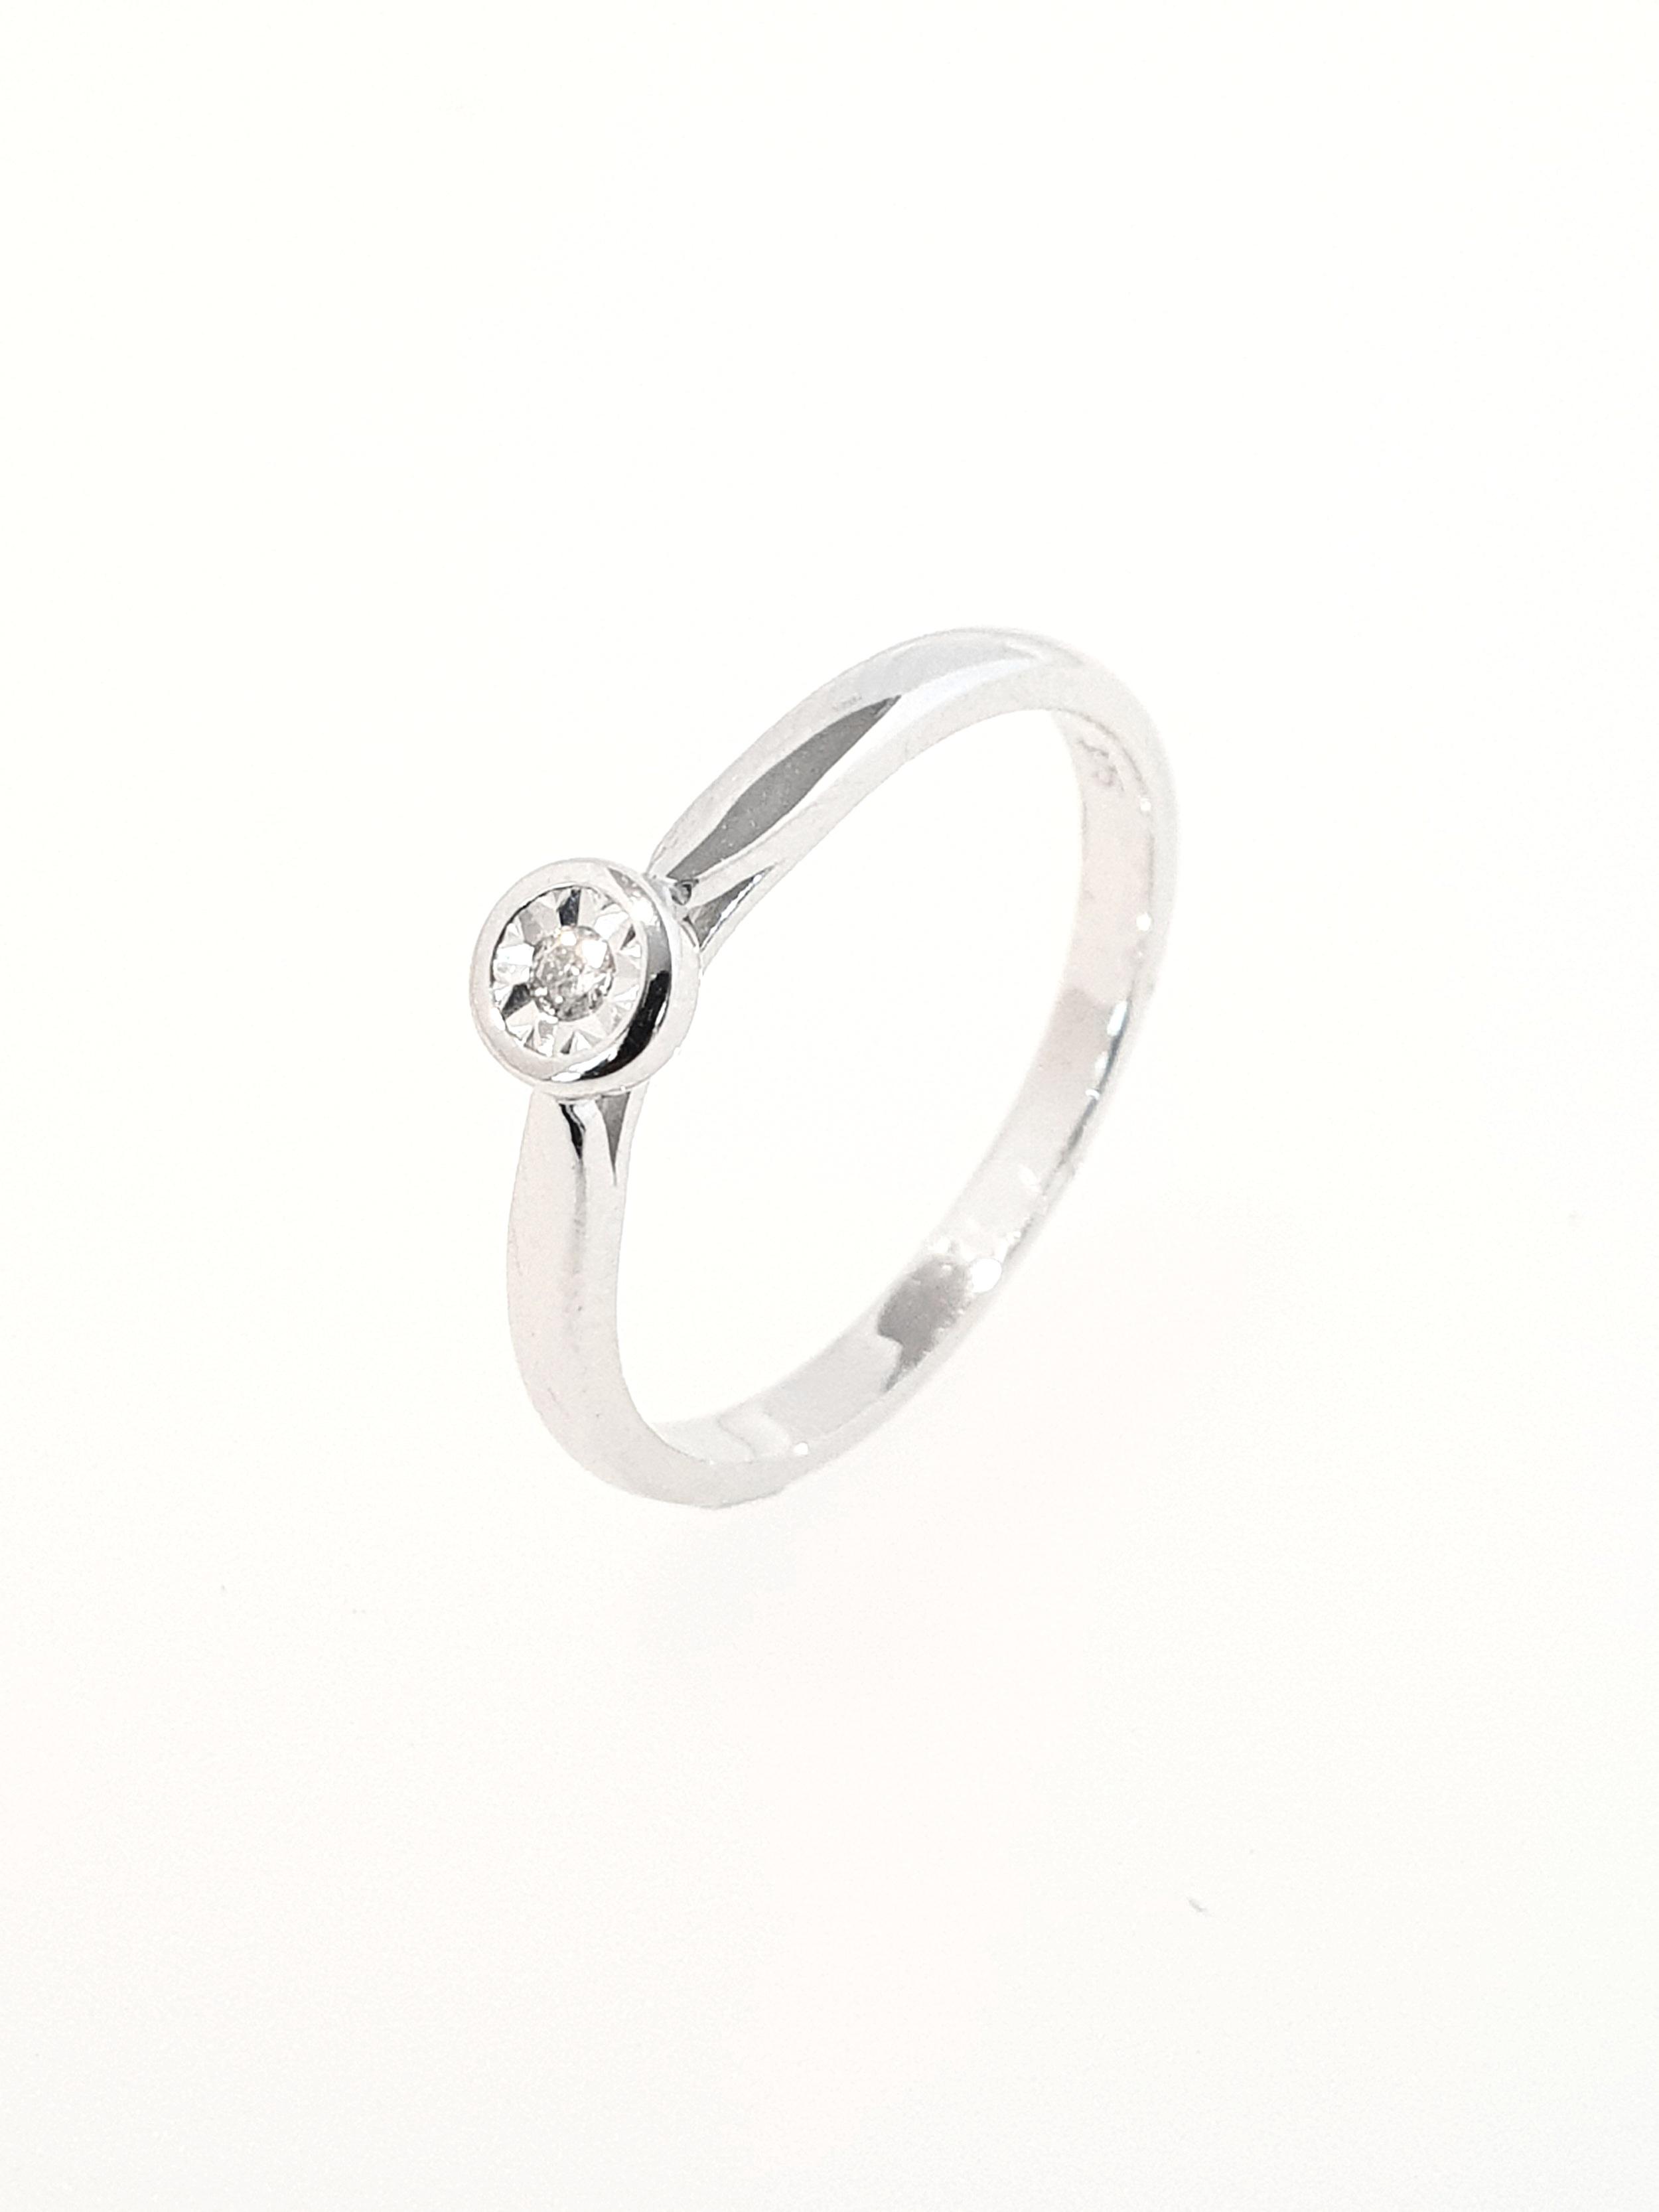 9ct White Gold Diamond Illusion RIng  .04ct  Stock Code: G1959  £300